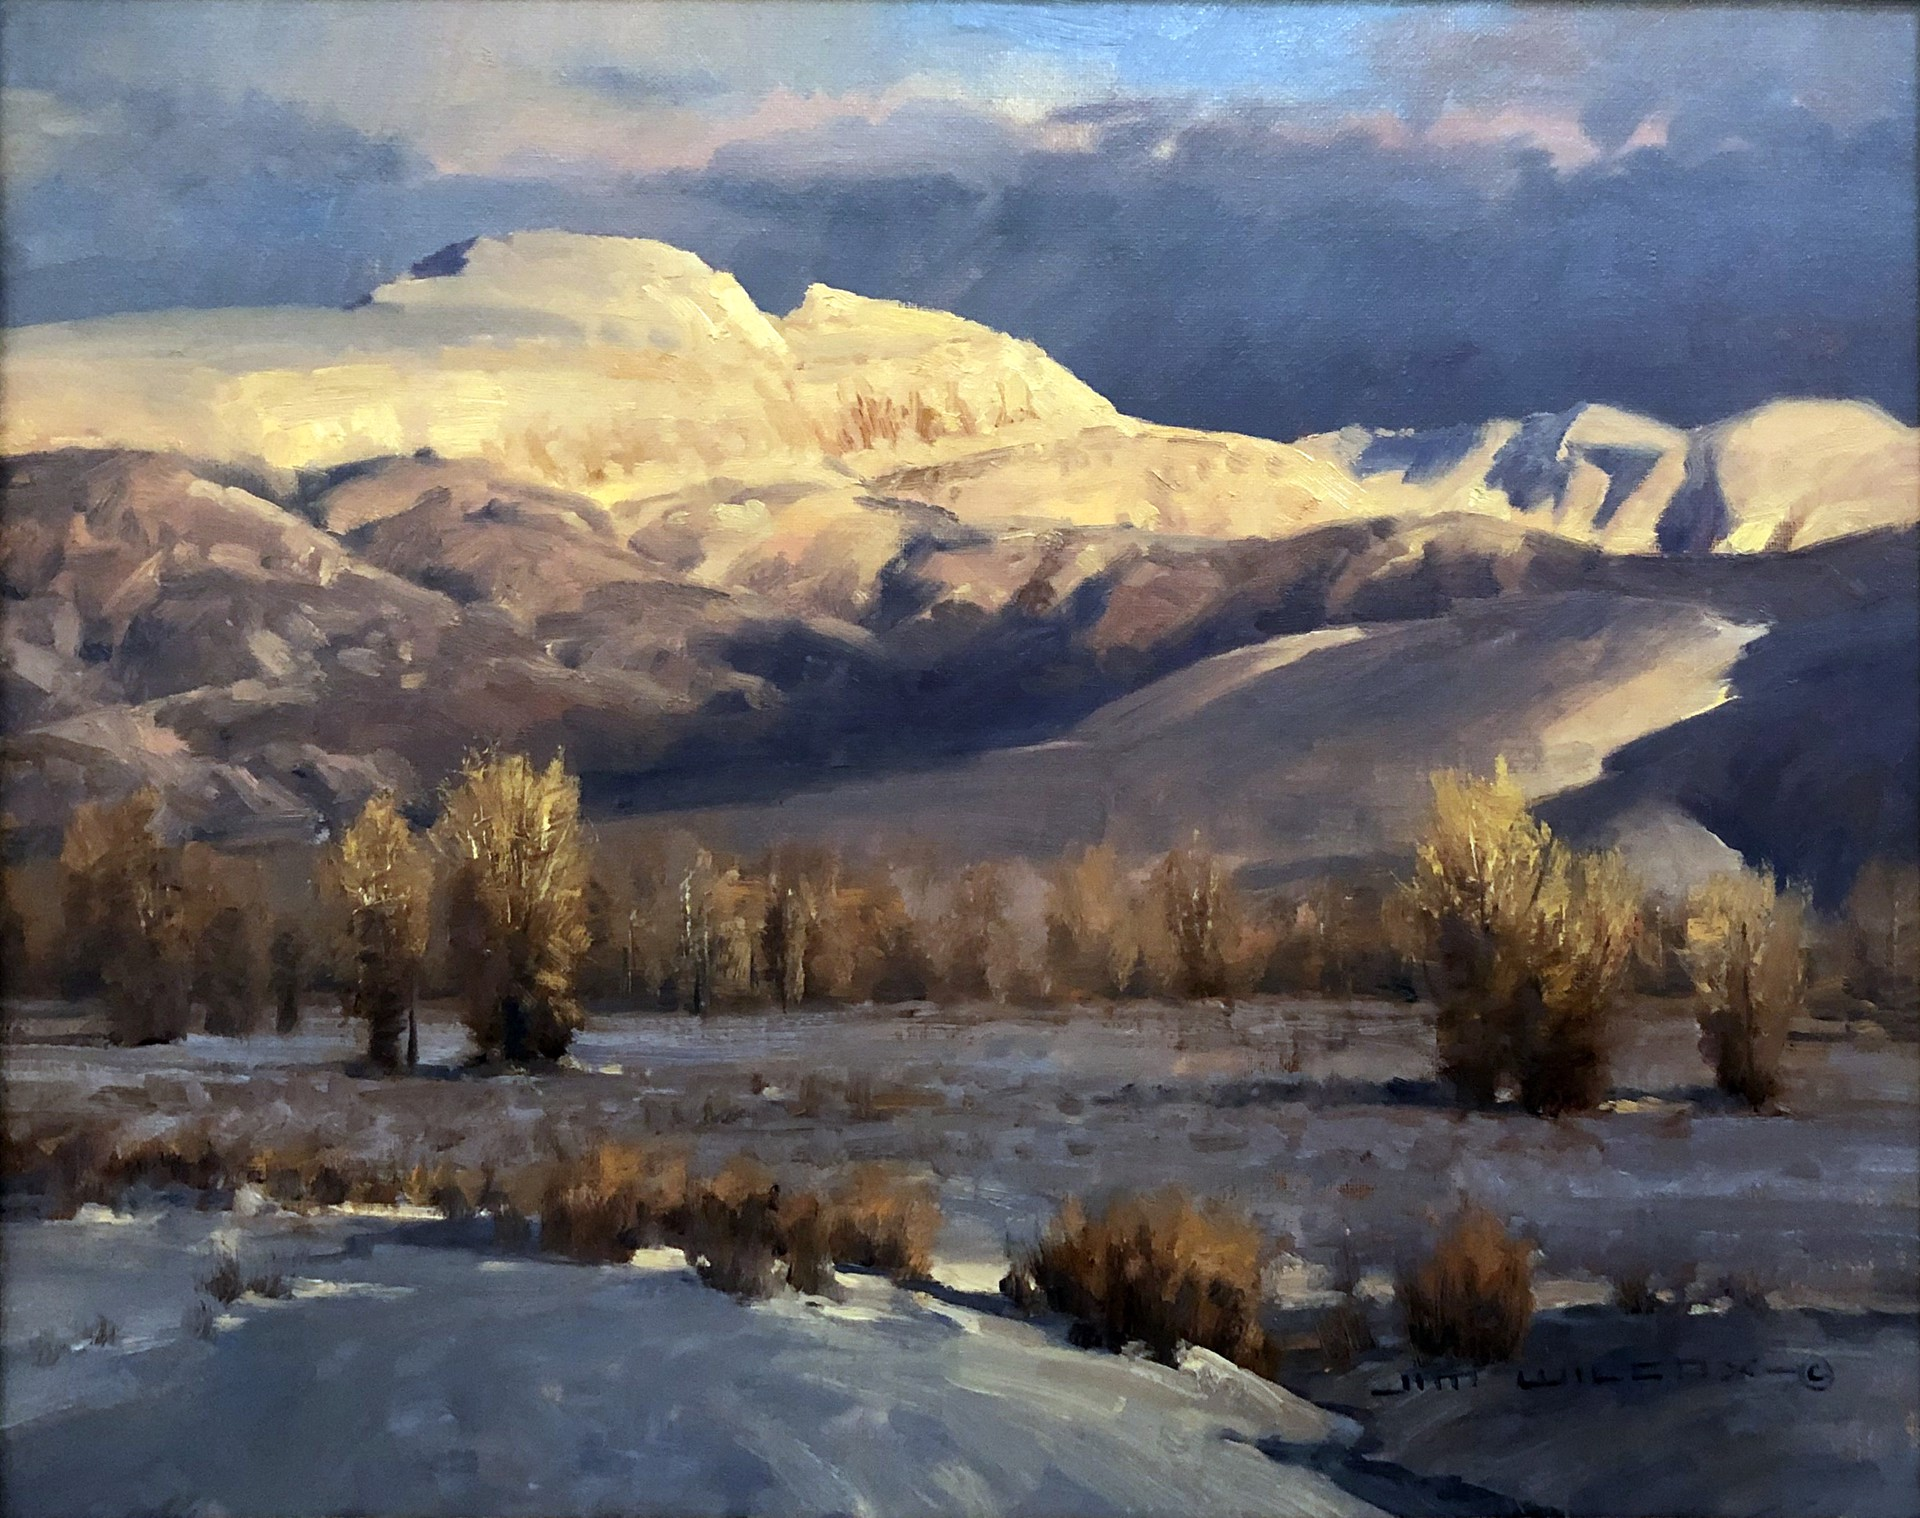 Sleeping Indian Winter by Jim Wilcox